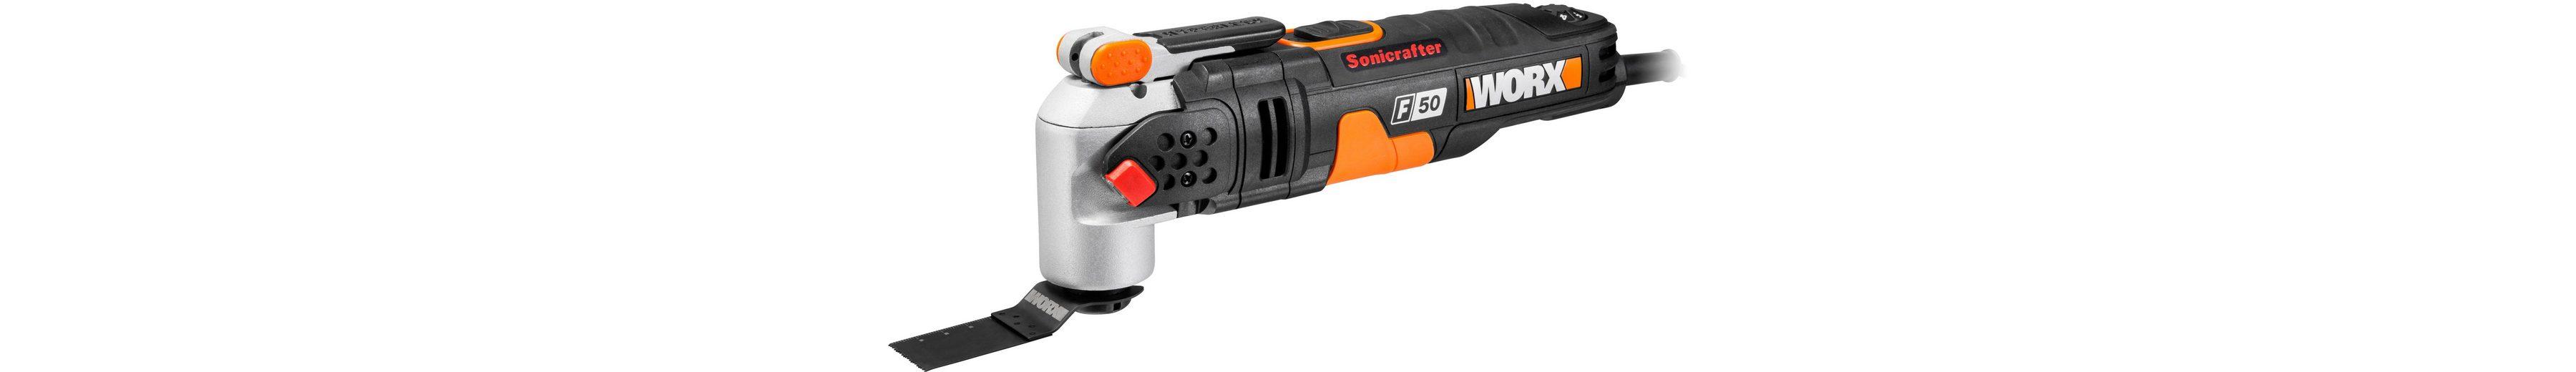 Multifunktionswerkzeug »Sonicrafter F50 / WX681«